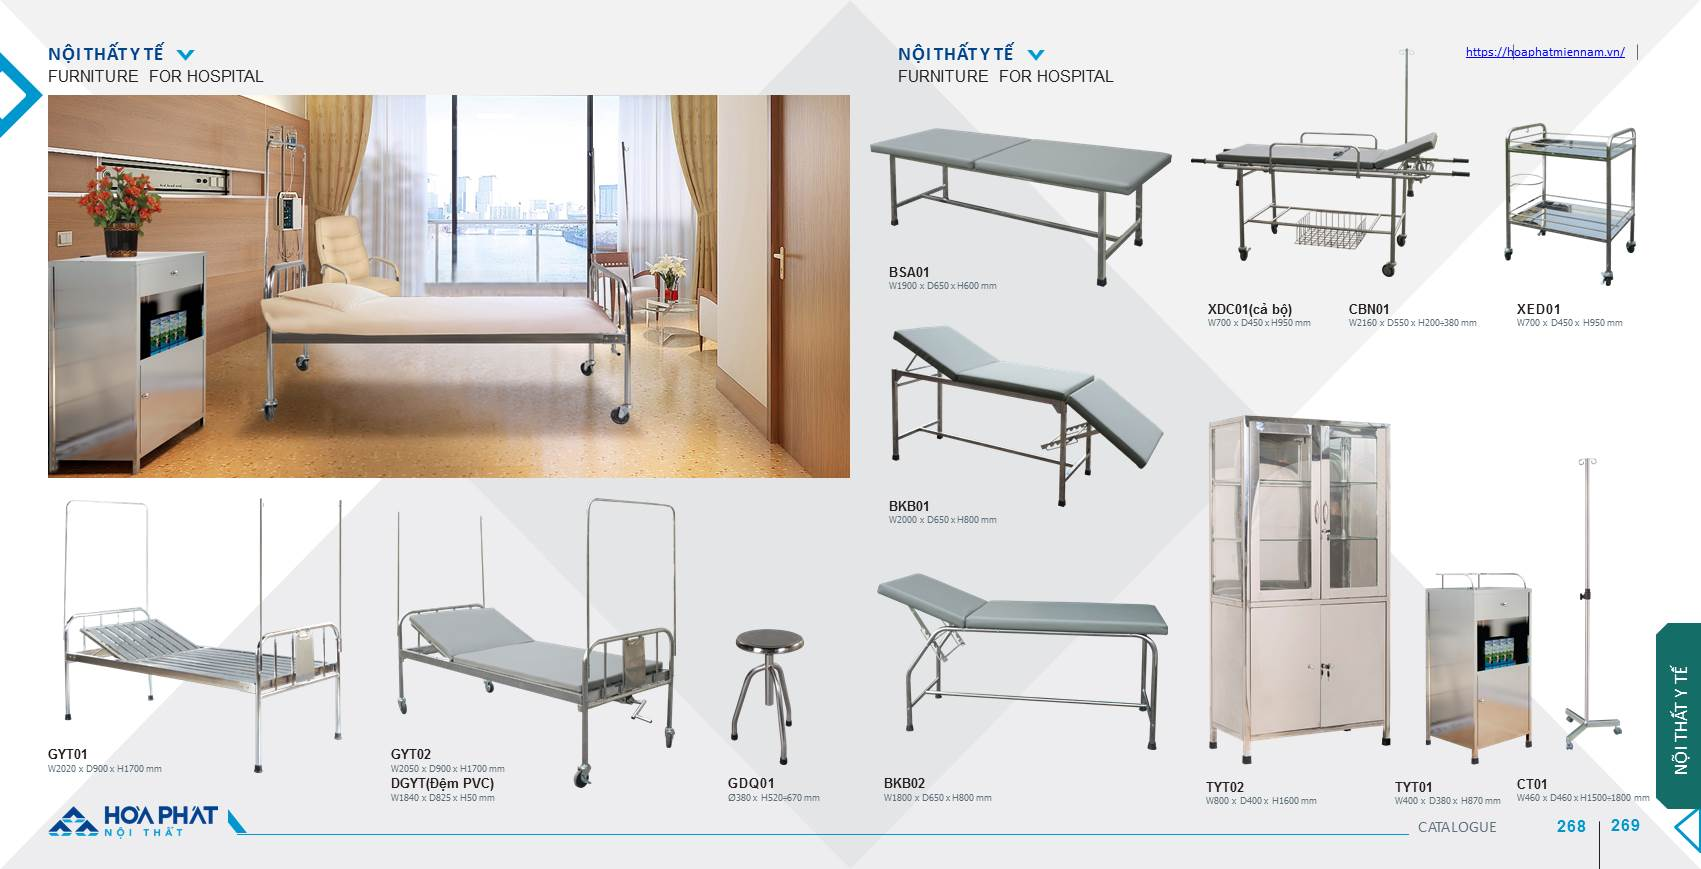 Catalogue nội thất Y tế Hòa Phát